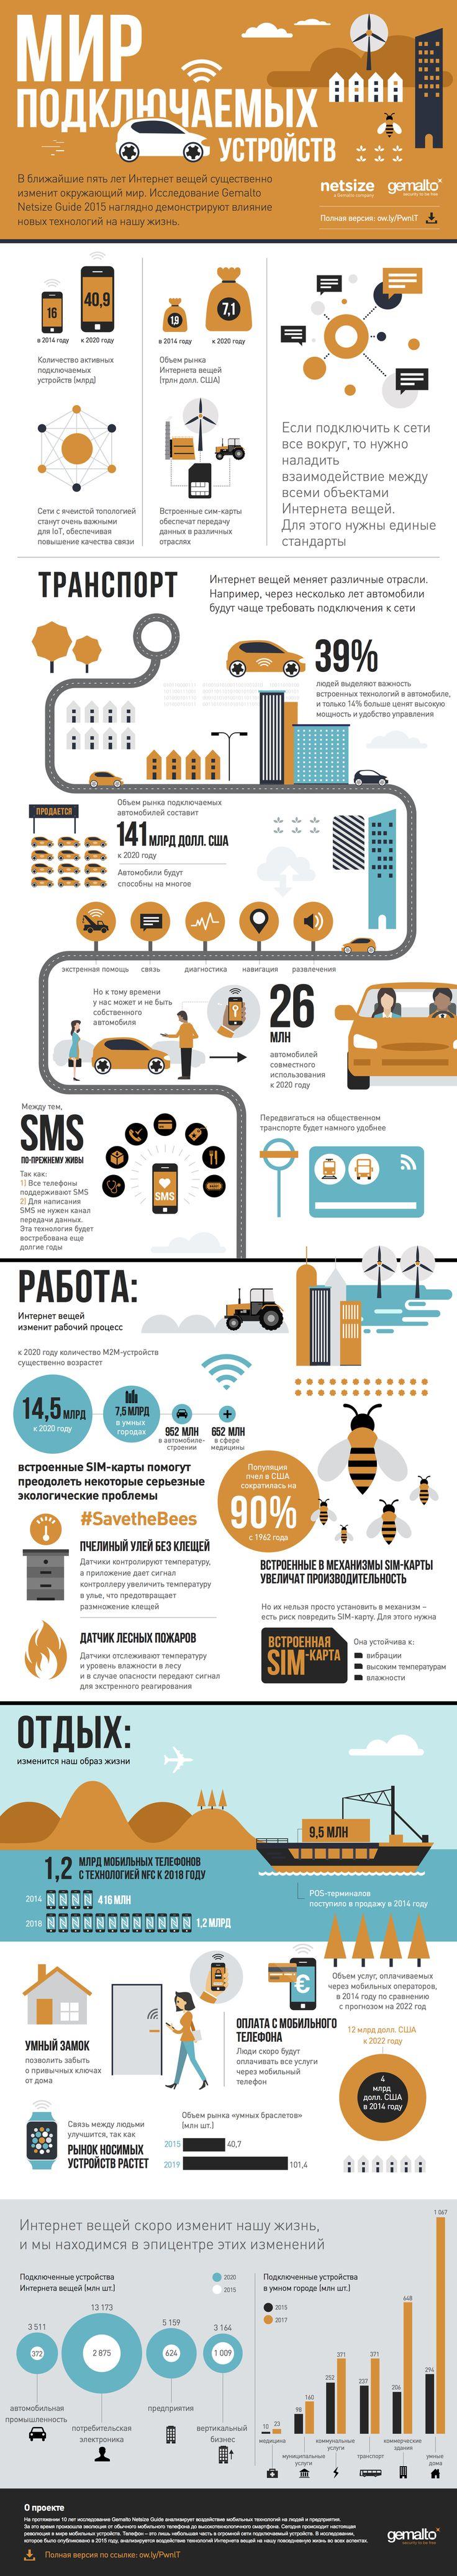 О развитии технологий Интернета вещей.